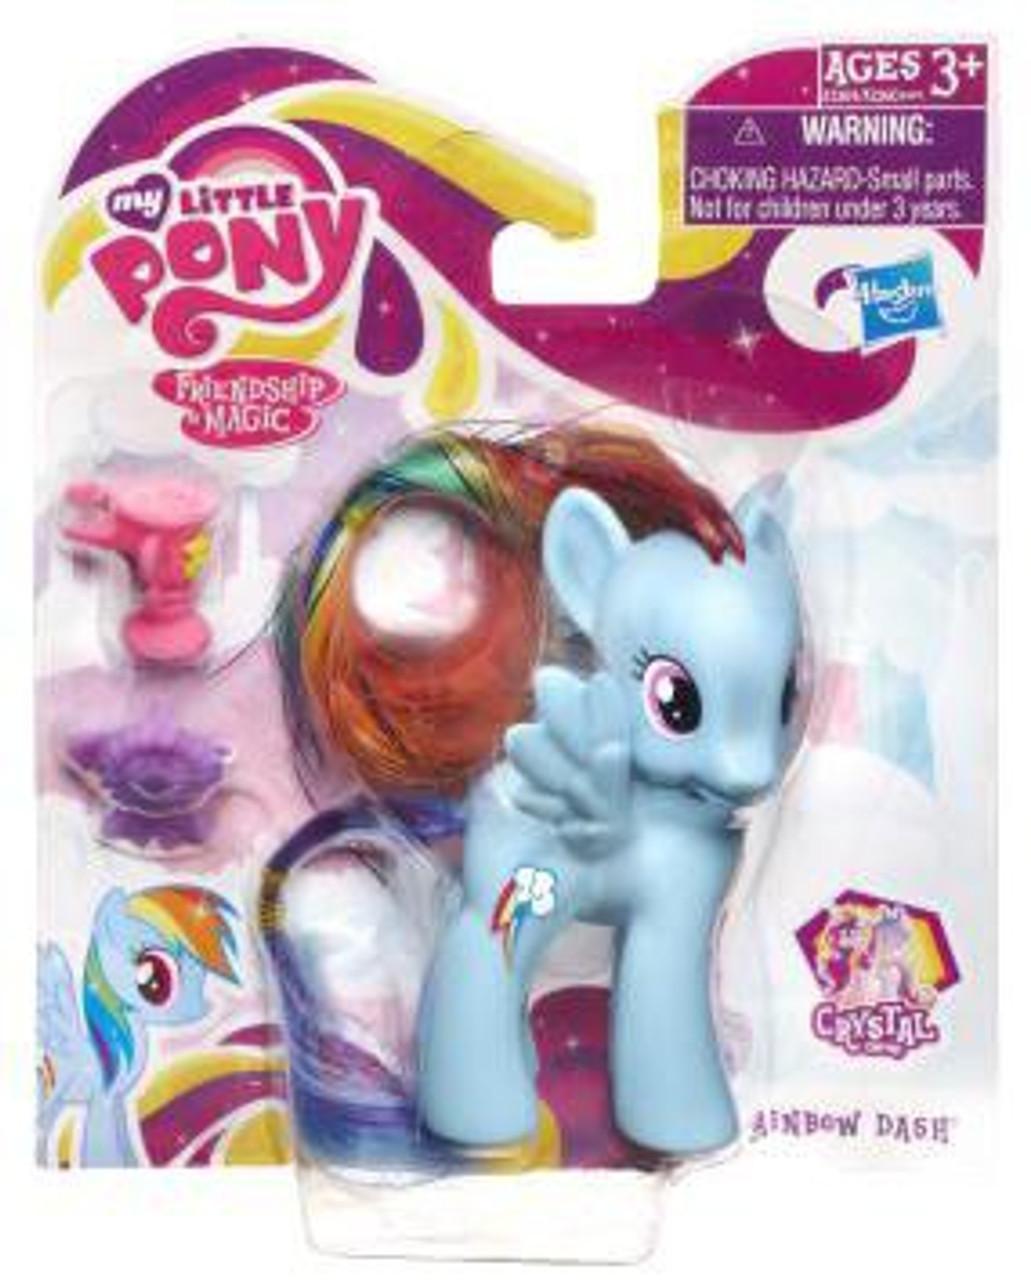 My Little Pony Friendship is Magic Crystal Empire Rainbow Dash Figure